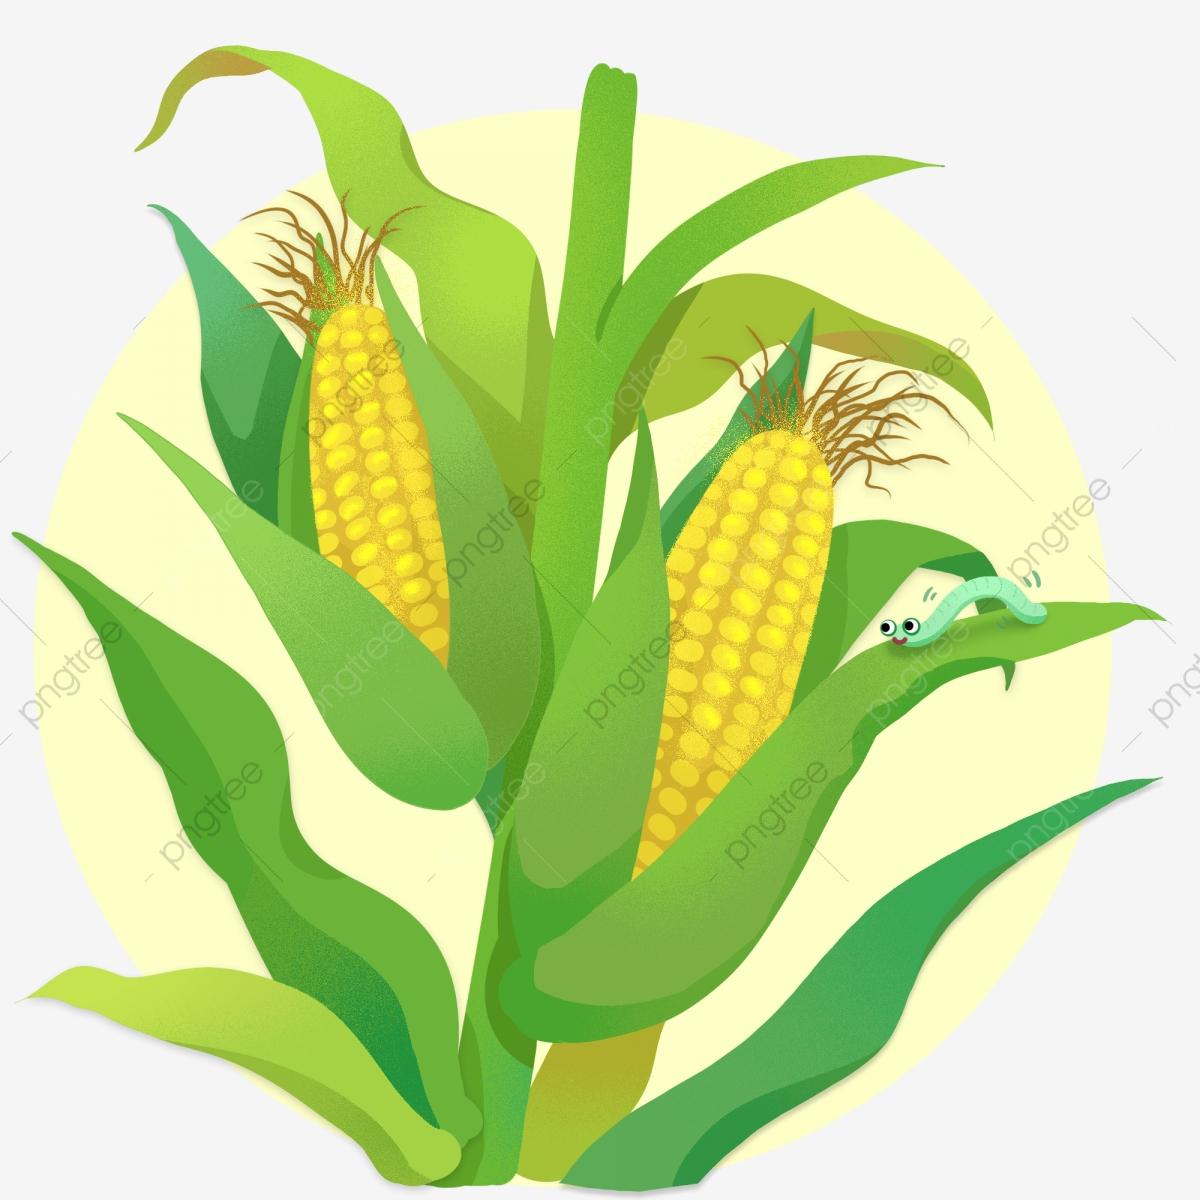 Crops clipart corn crop. Plants autumn and harvest